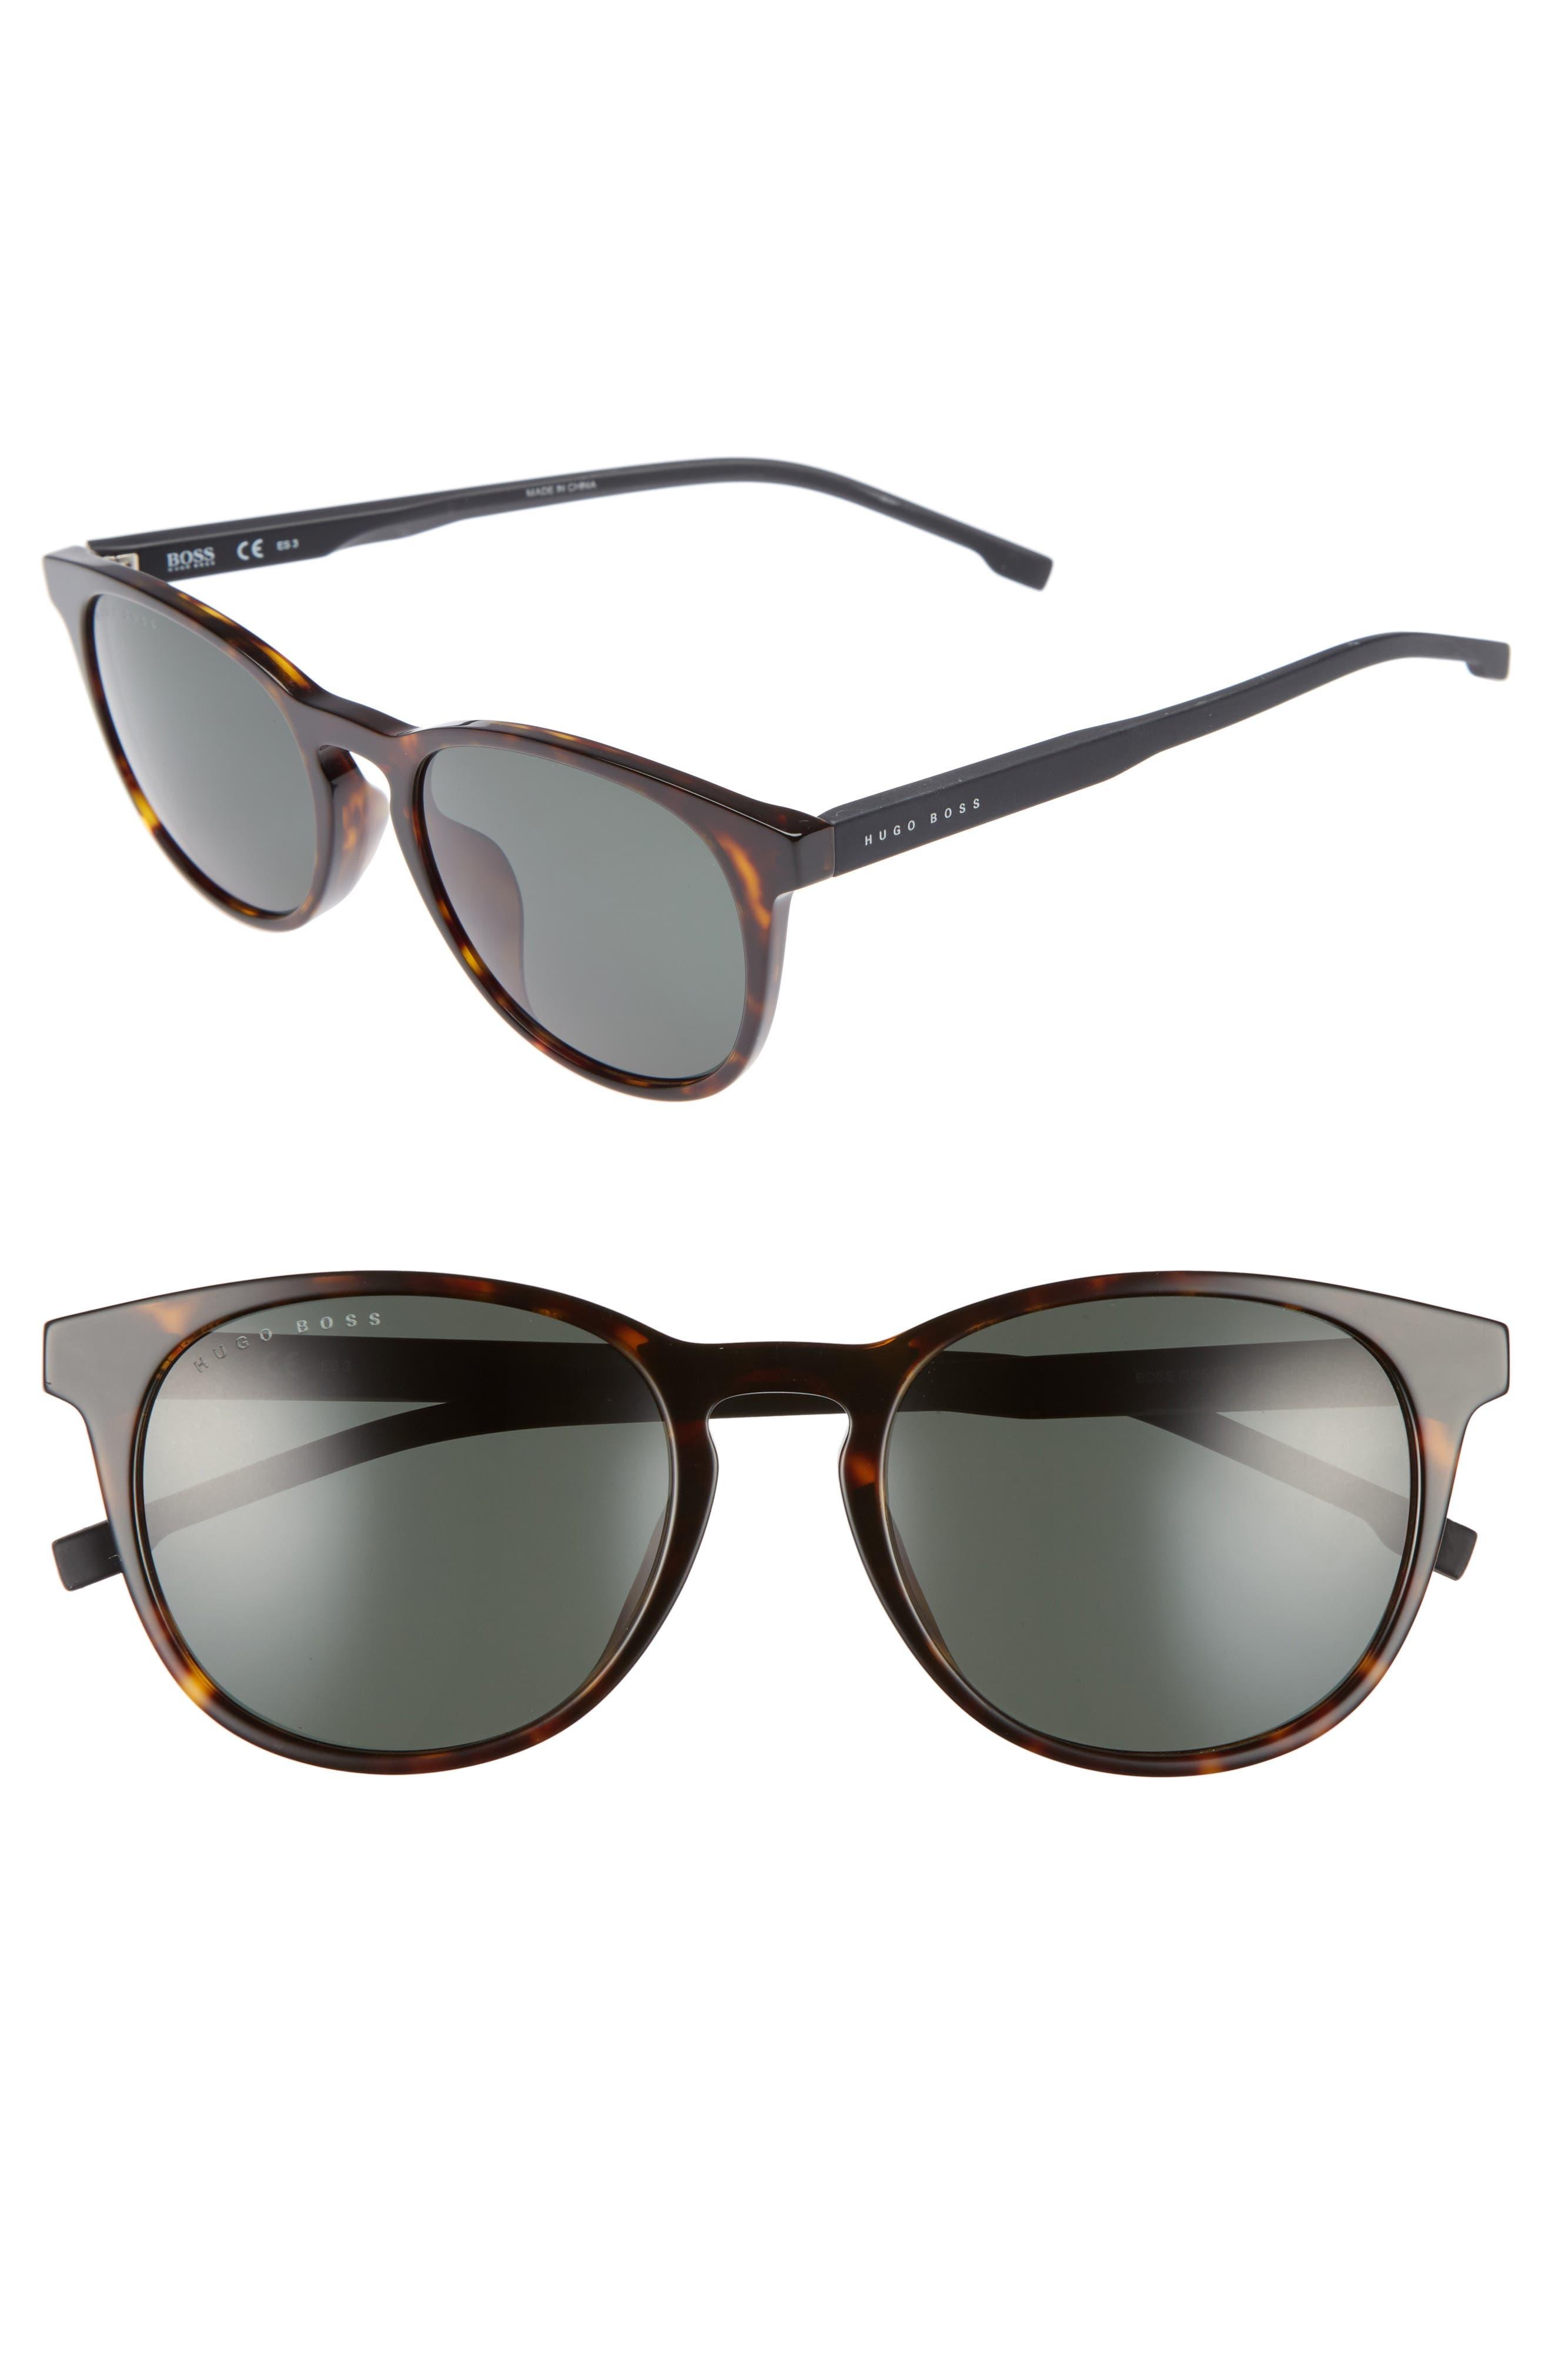 54mm Sunglasses,                             Main thumbnail 1, color,                             DARK HAVANA/ GREEN